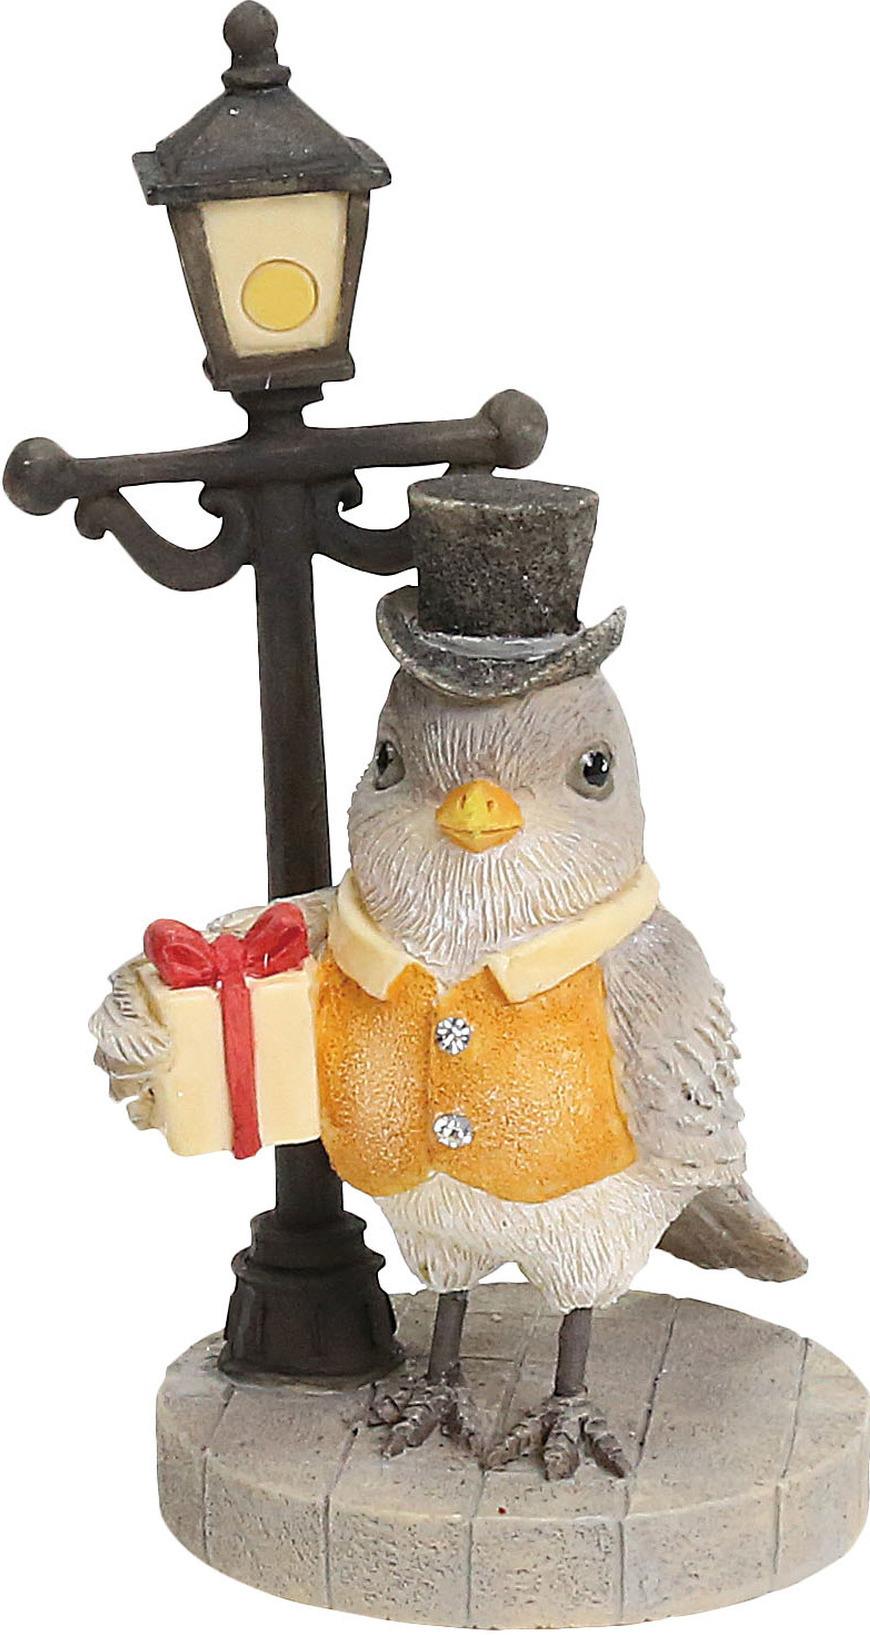 Heart of Christmas 6001377 Baby Birds - dandy